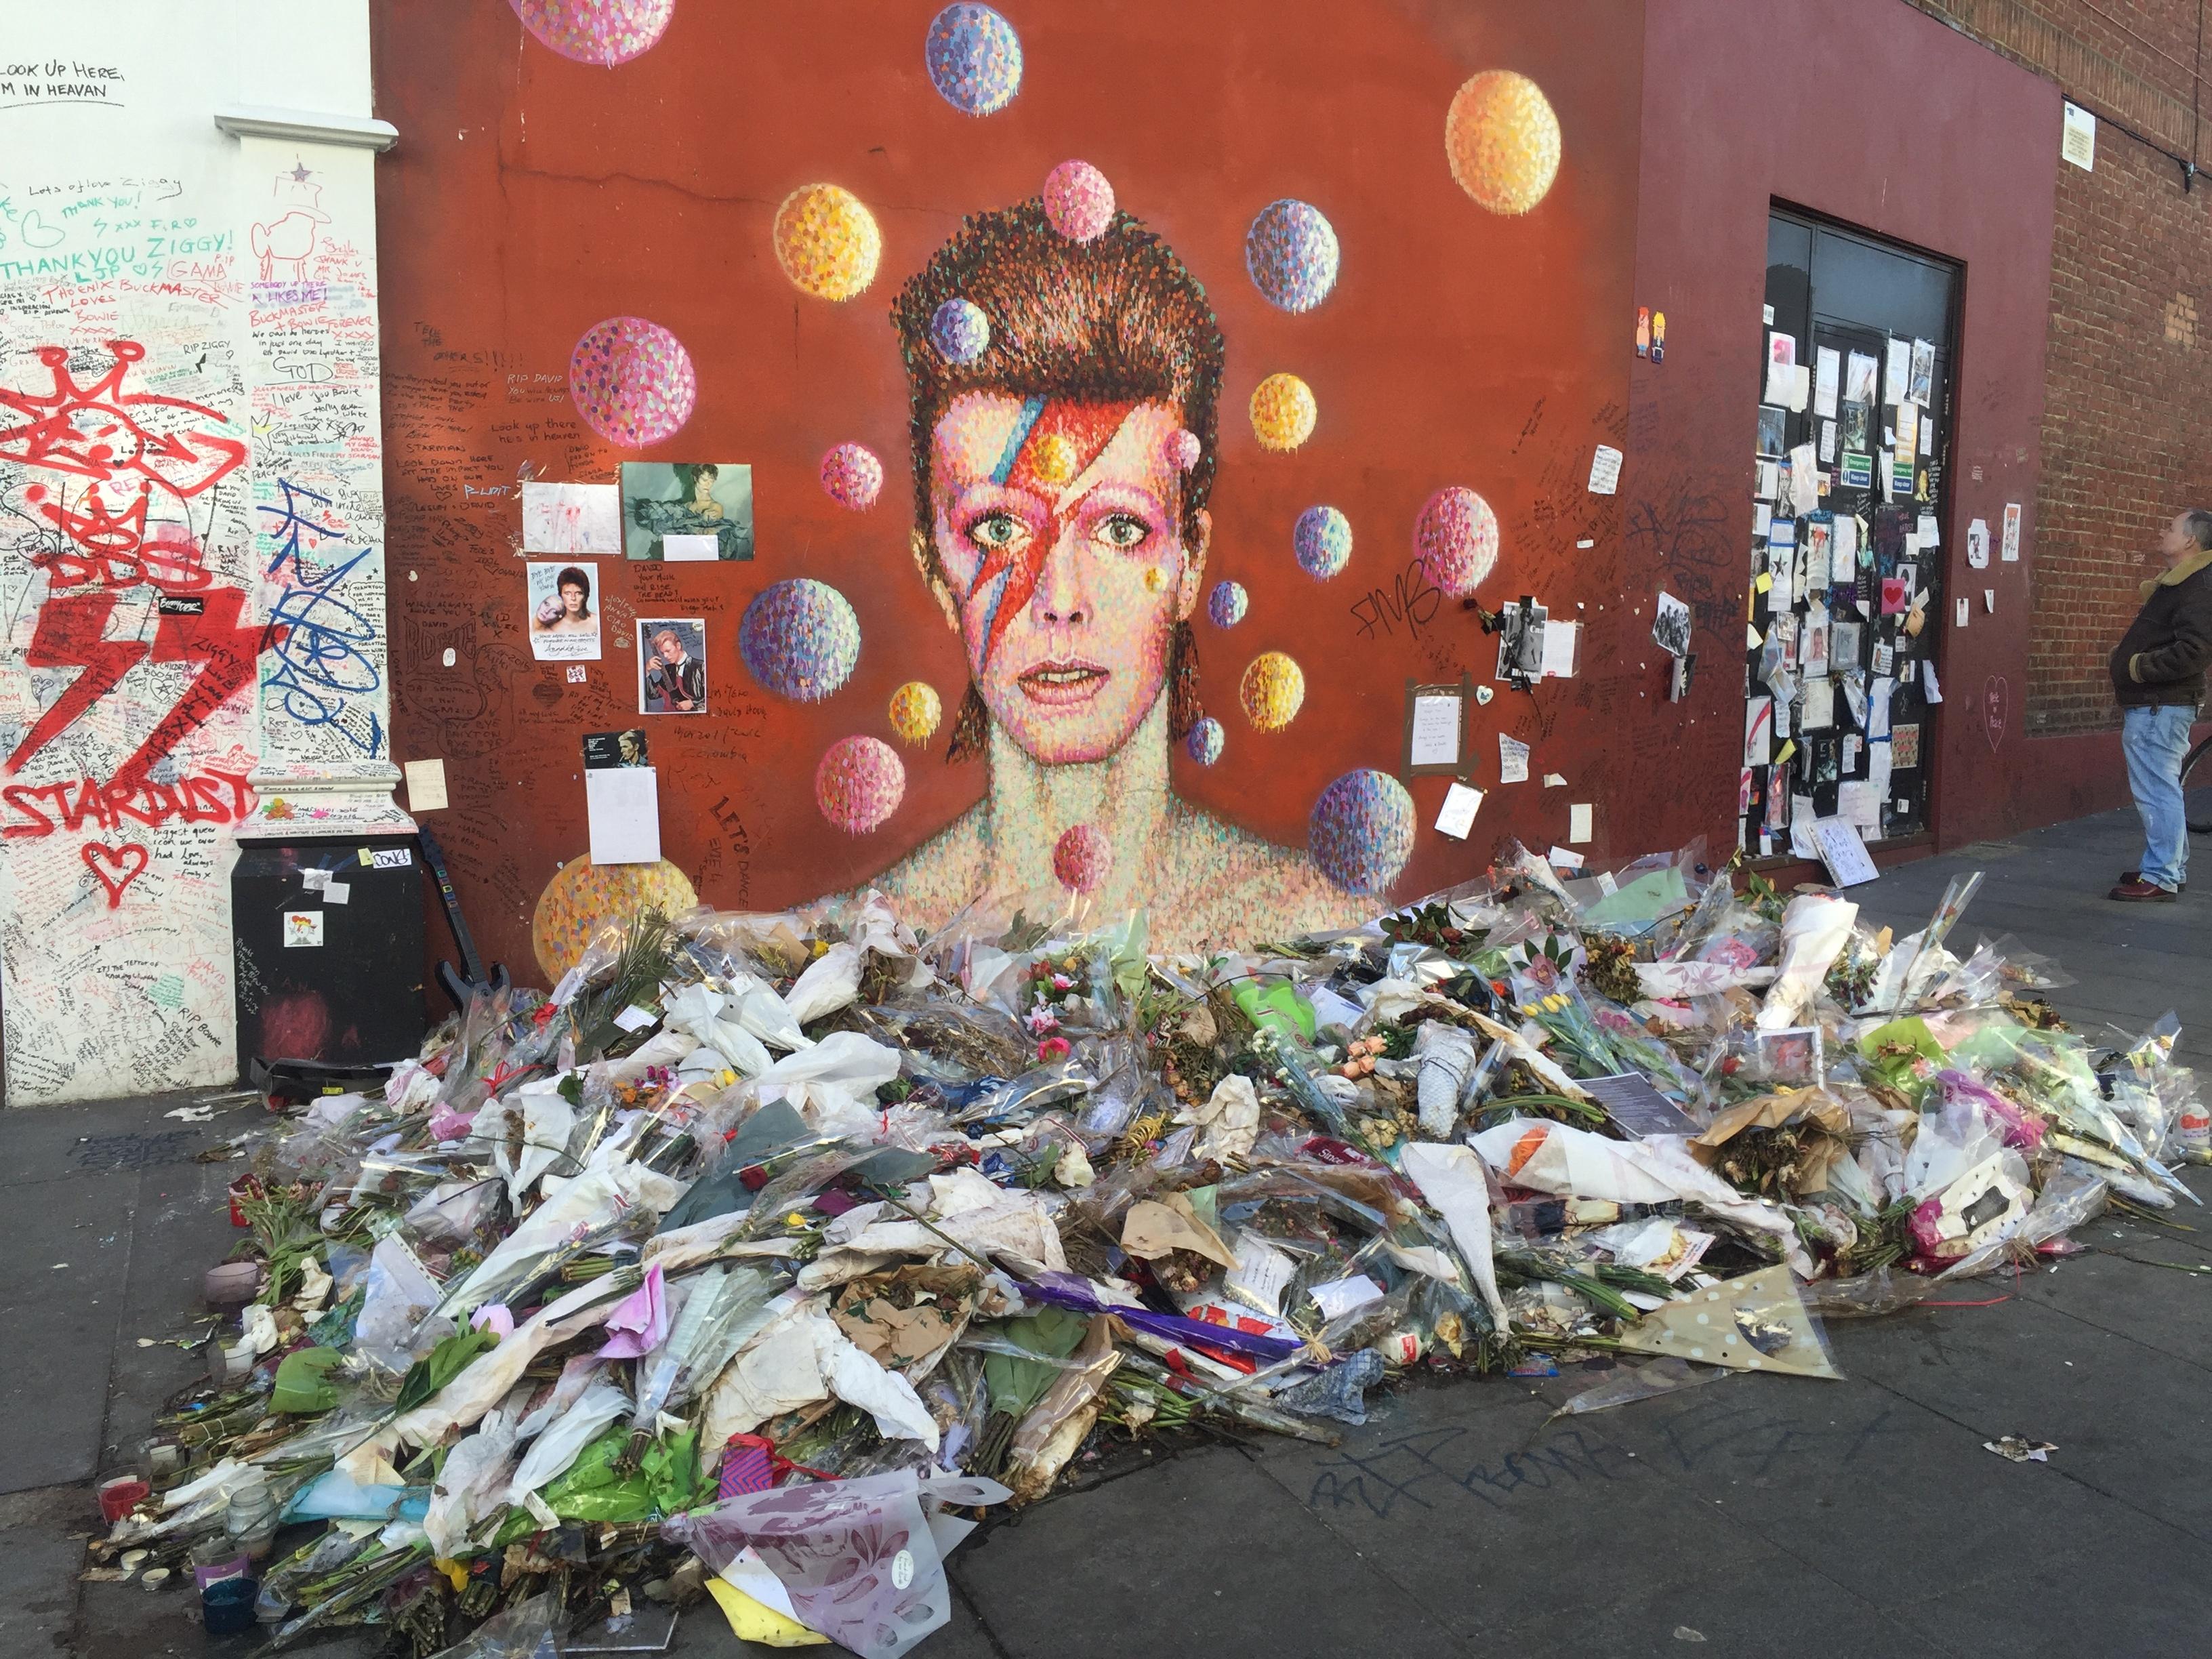 CAPAStudyAbroad_From Rachel Long_Interview_David Bowie mural in Brixton - Feb 2017.jpg